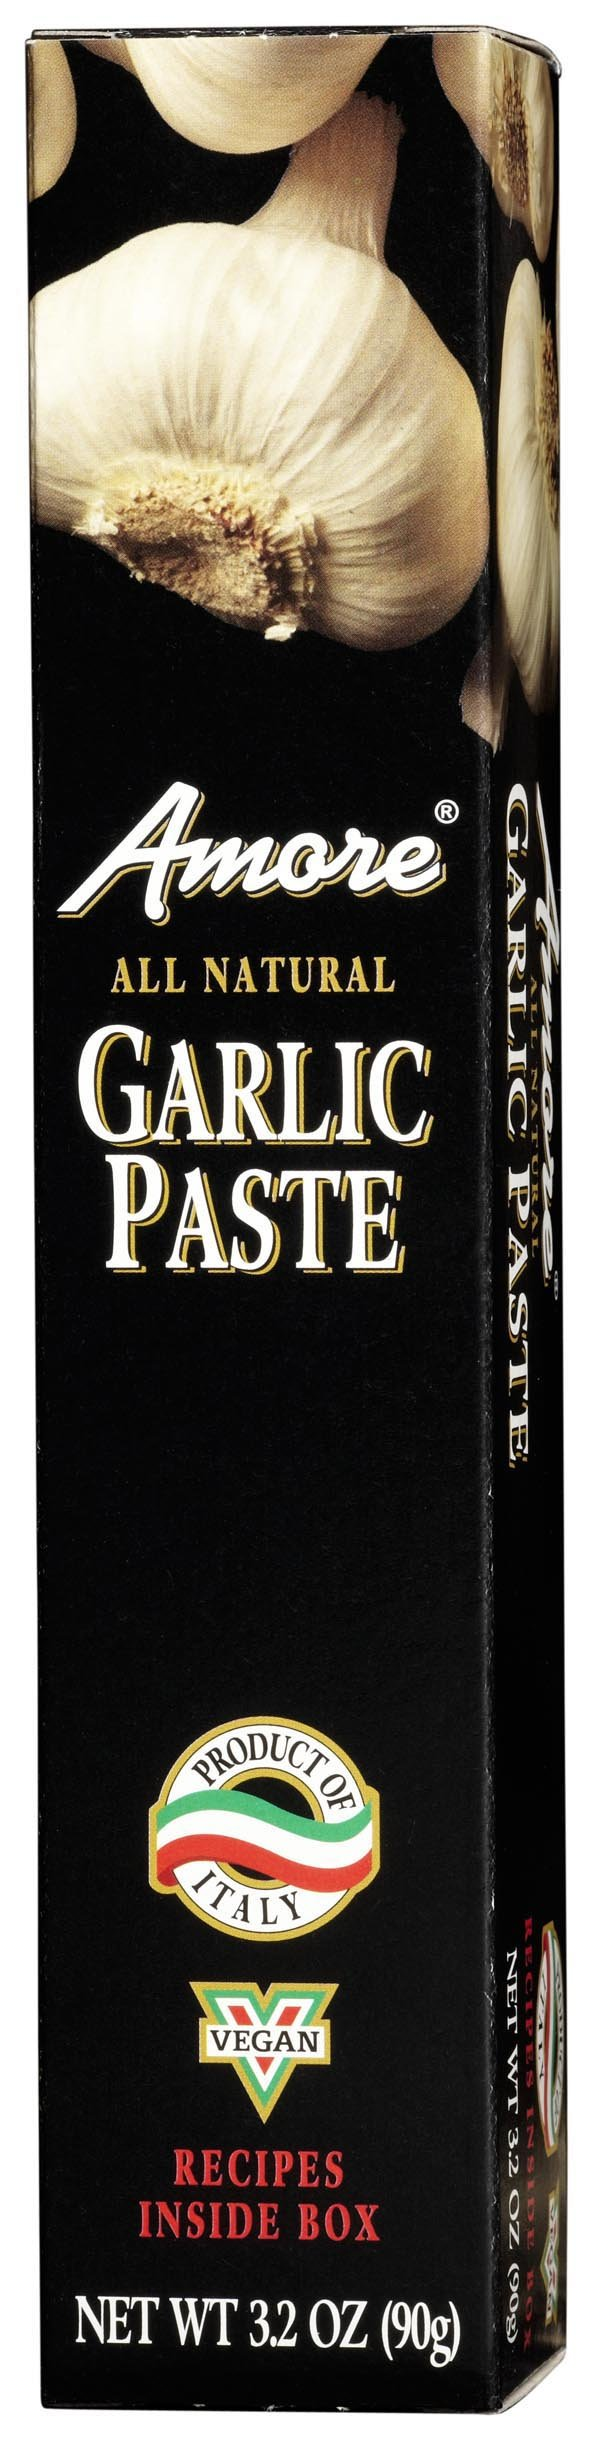 Amore Garlic Paste - Tube, 3.2 Ounce -- 12 per case.